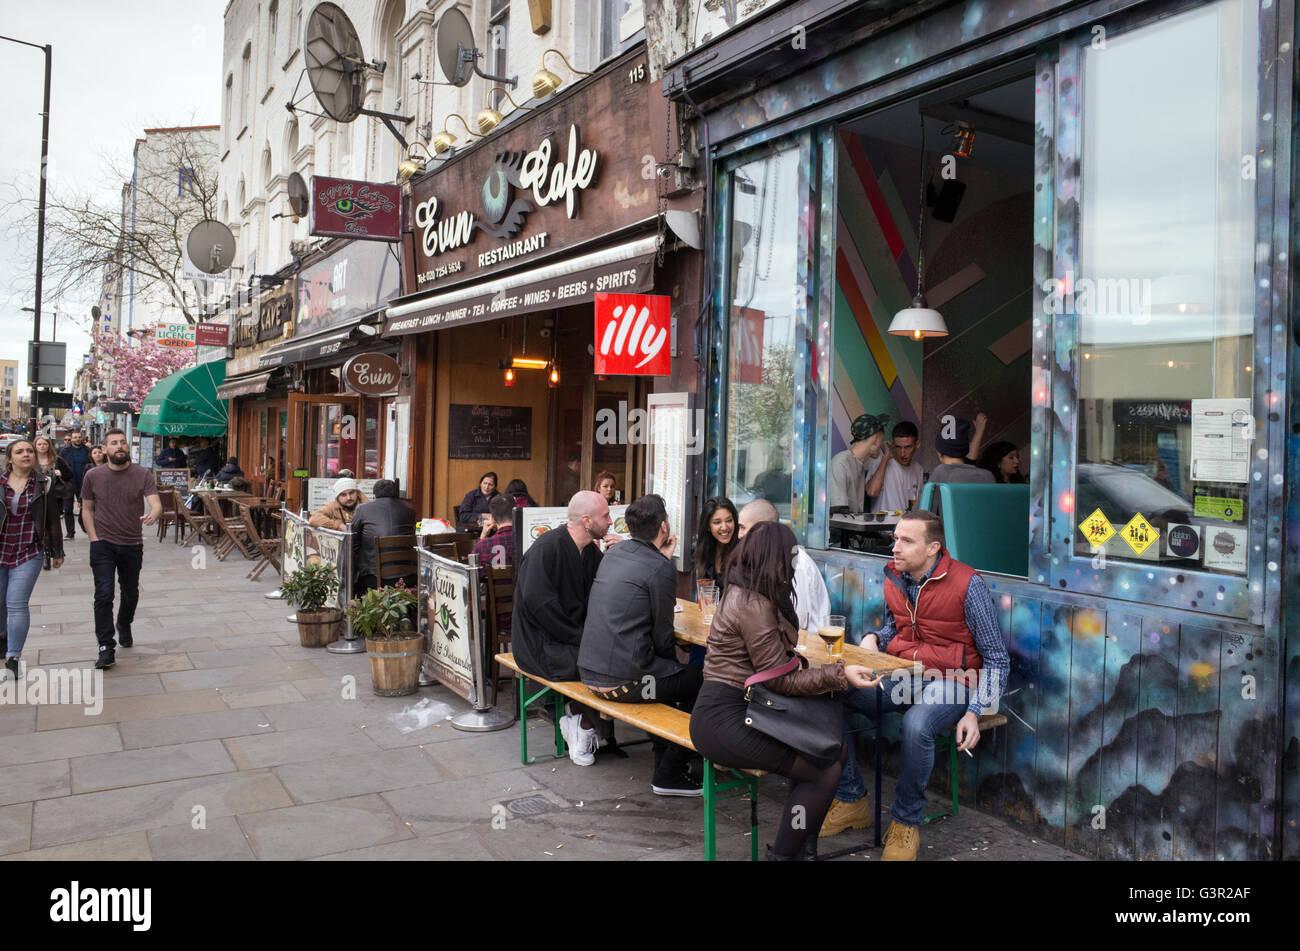 Bars branchés sur Kingsland High Street à Dalston, Hackney, Londres, Angleterre, RU Photo Stock